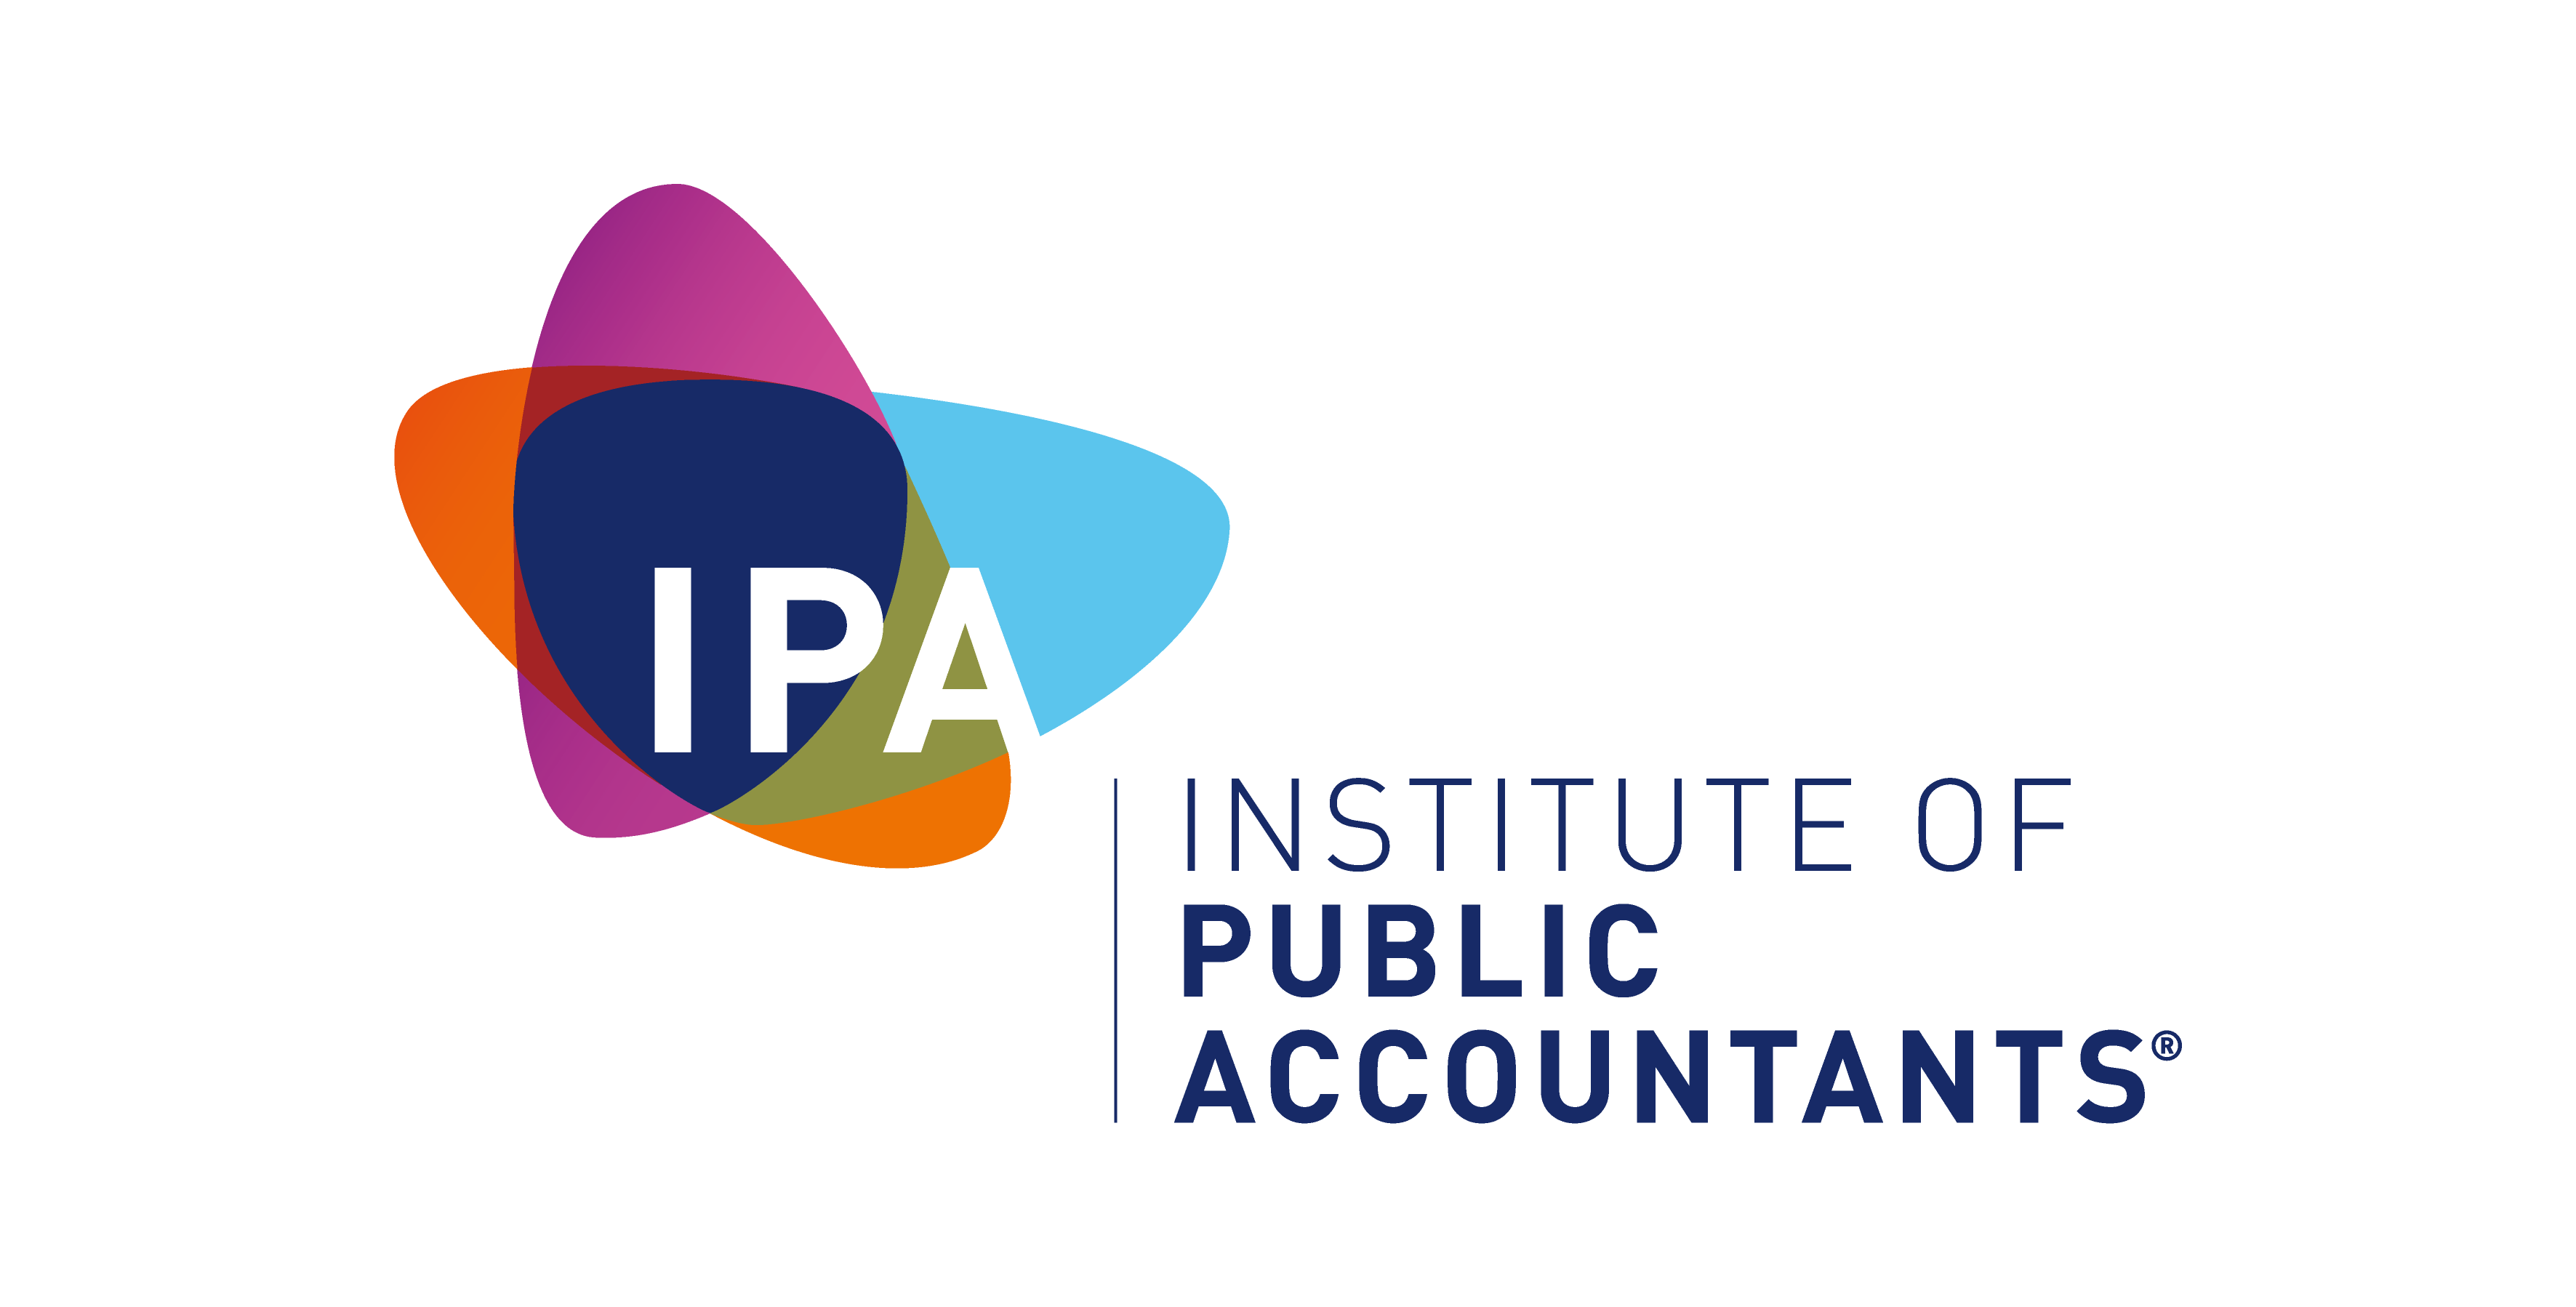 IPA_sprite2